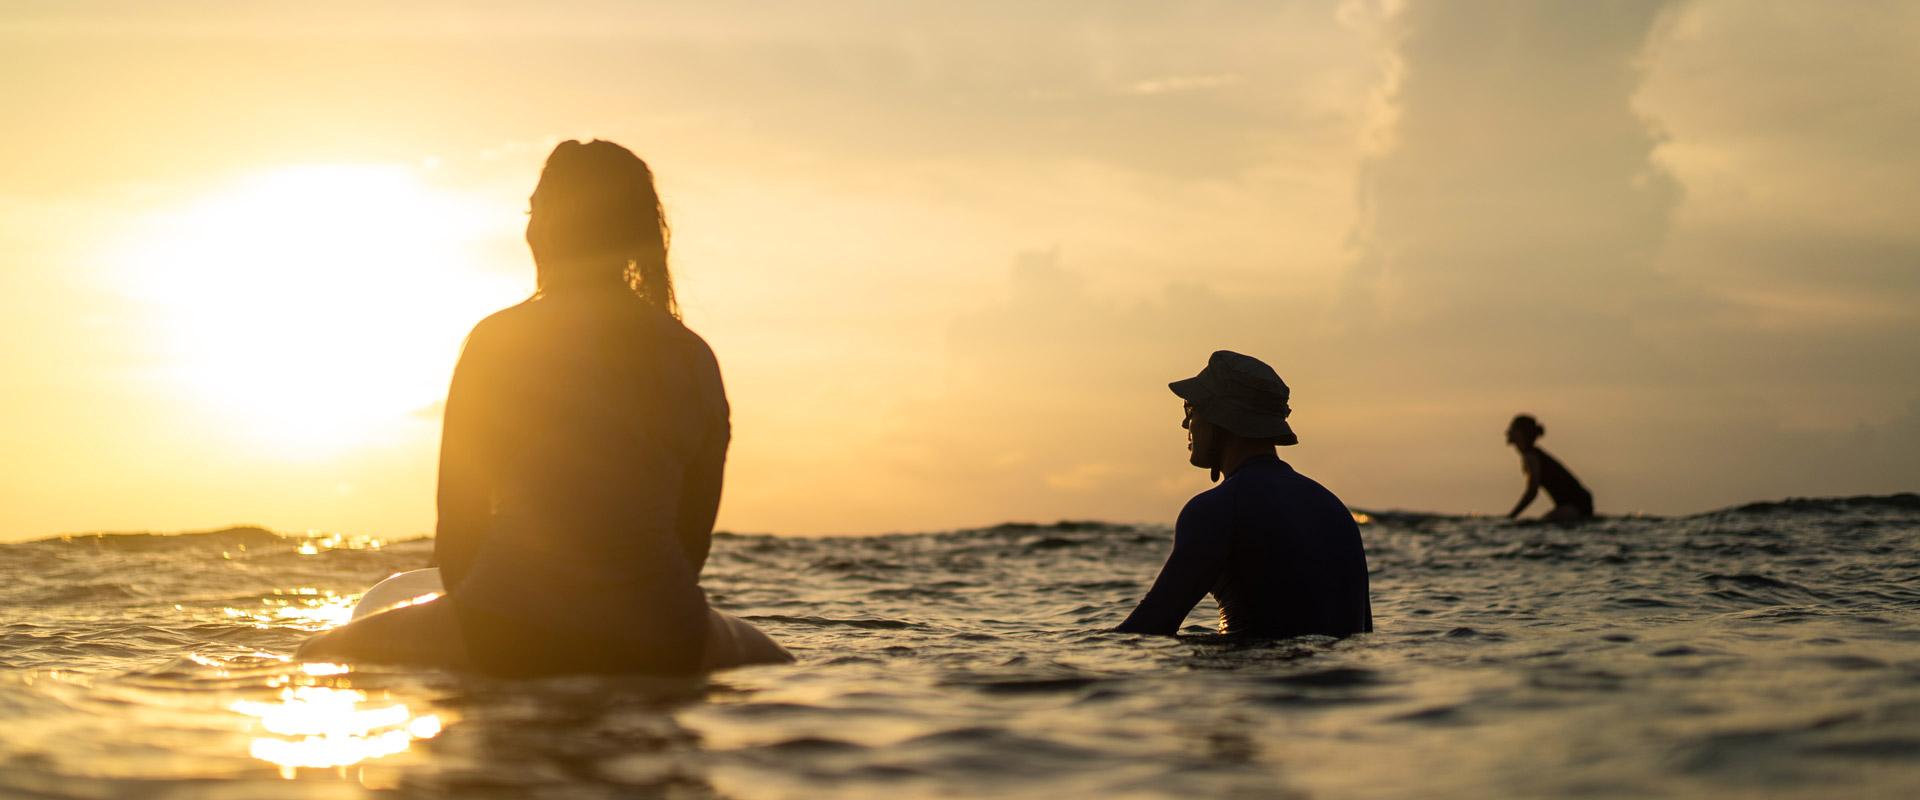 camp-de-surf-nicaragua